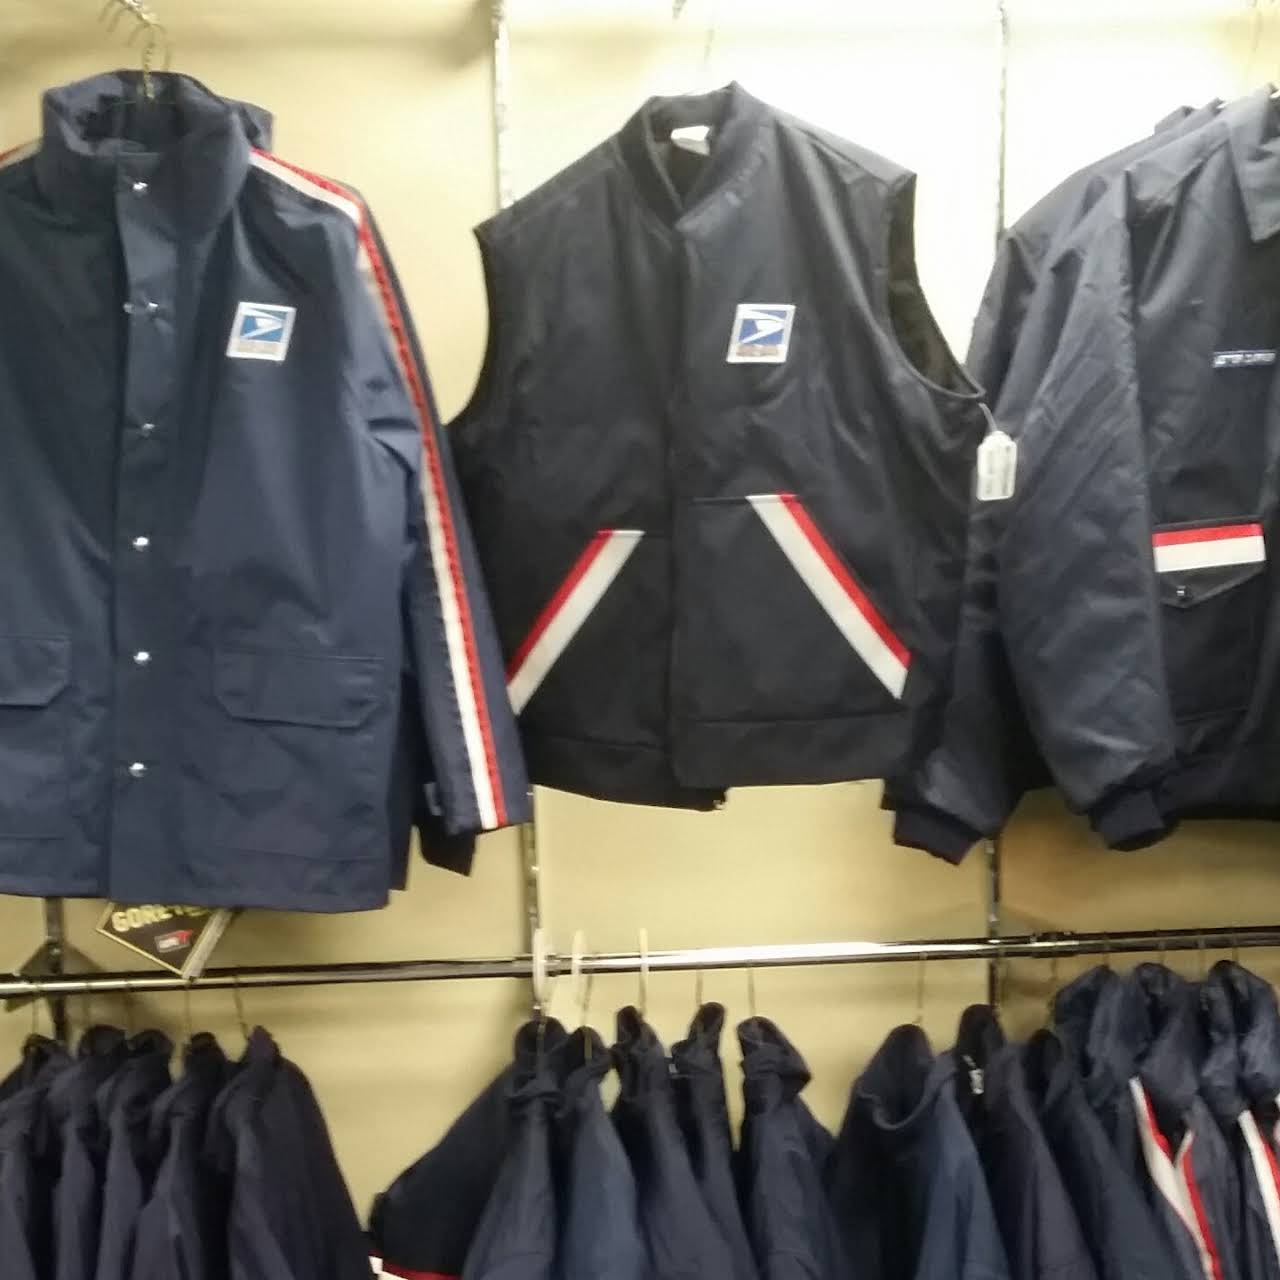 46c92205046 Uniform Bonus - USPS Postal Uniforms Supplier